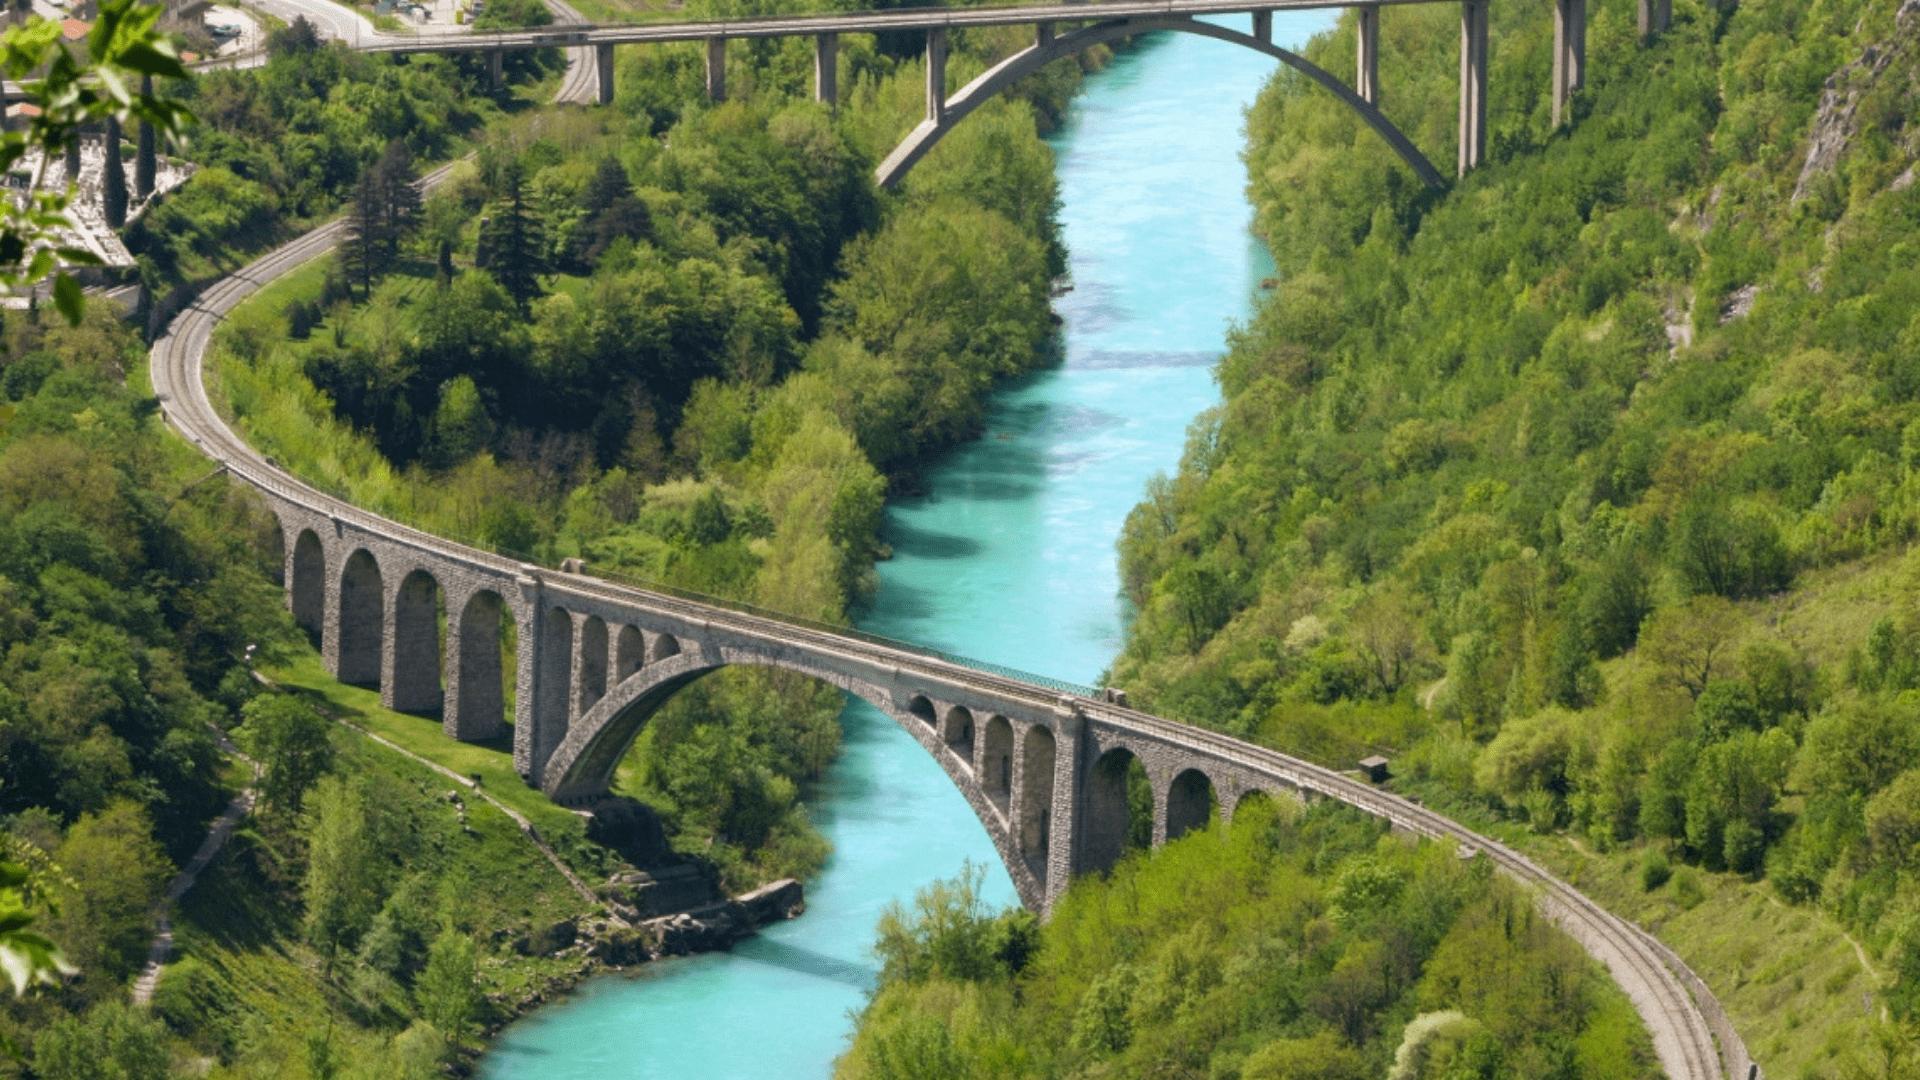 Ko gero gražiausias šalies Tiltas - Solkano tiltas